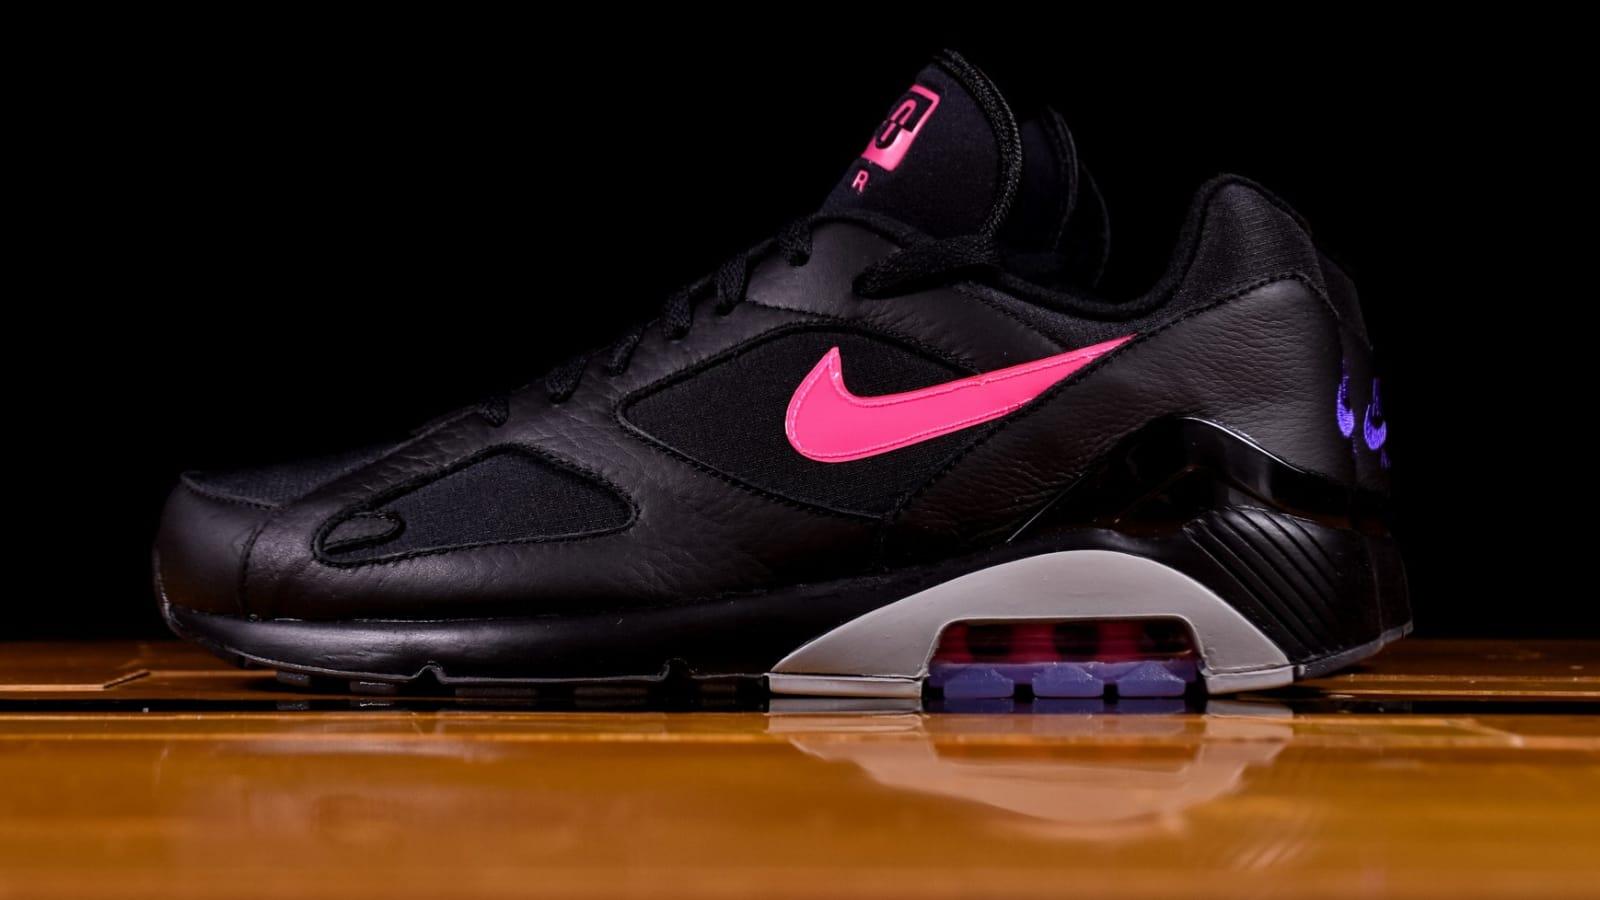 Nike Air Max 1 Ultra Moire Dark Grey Black hungryandhomeless